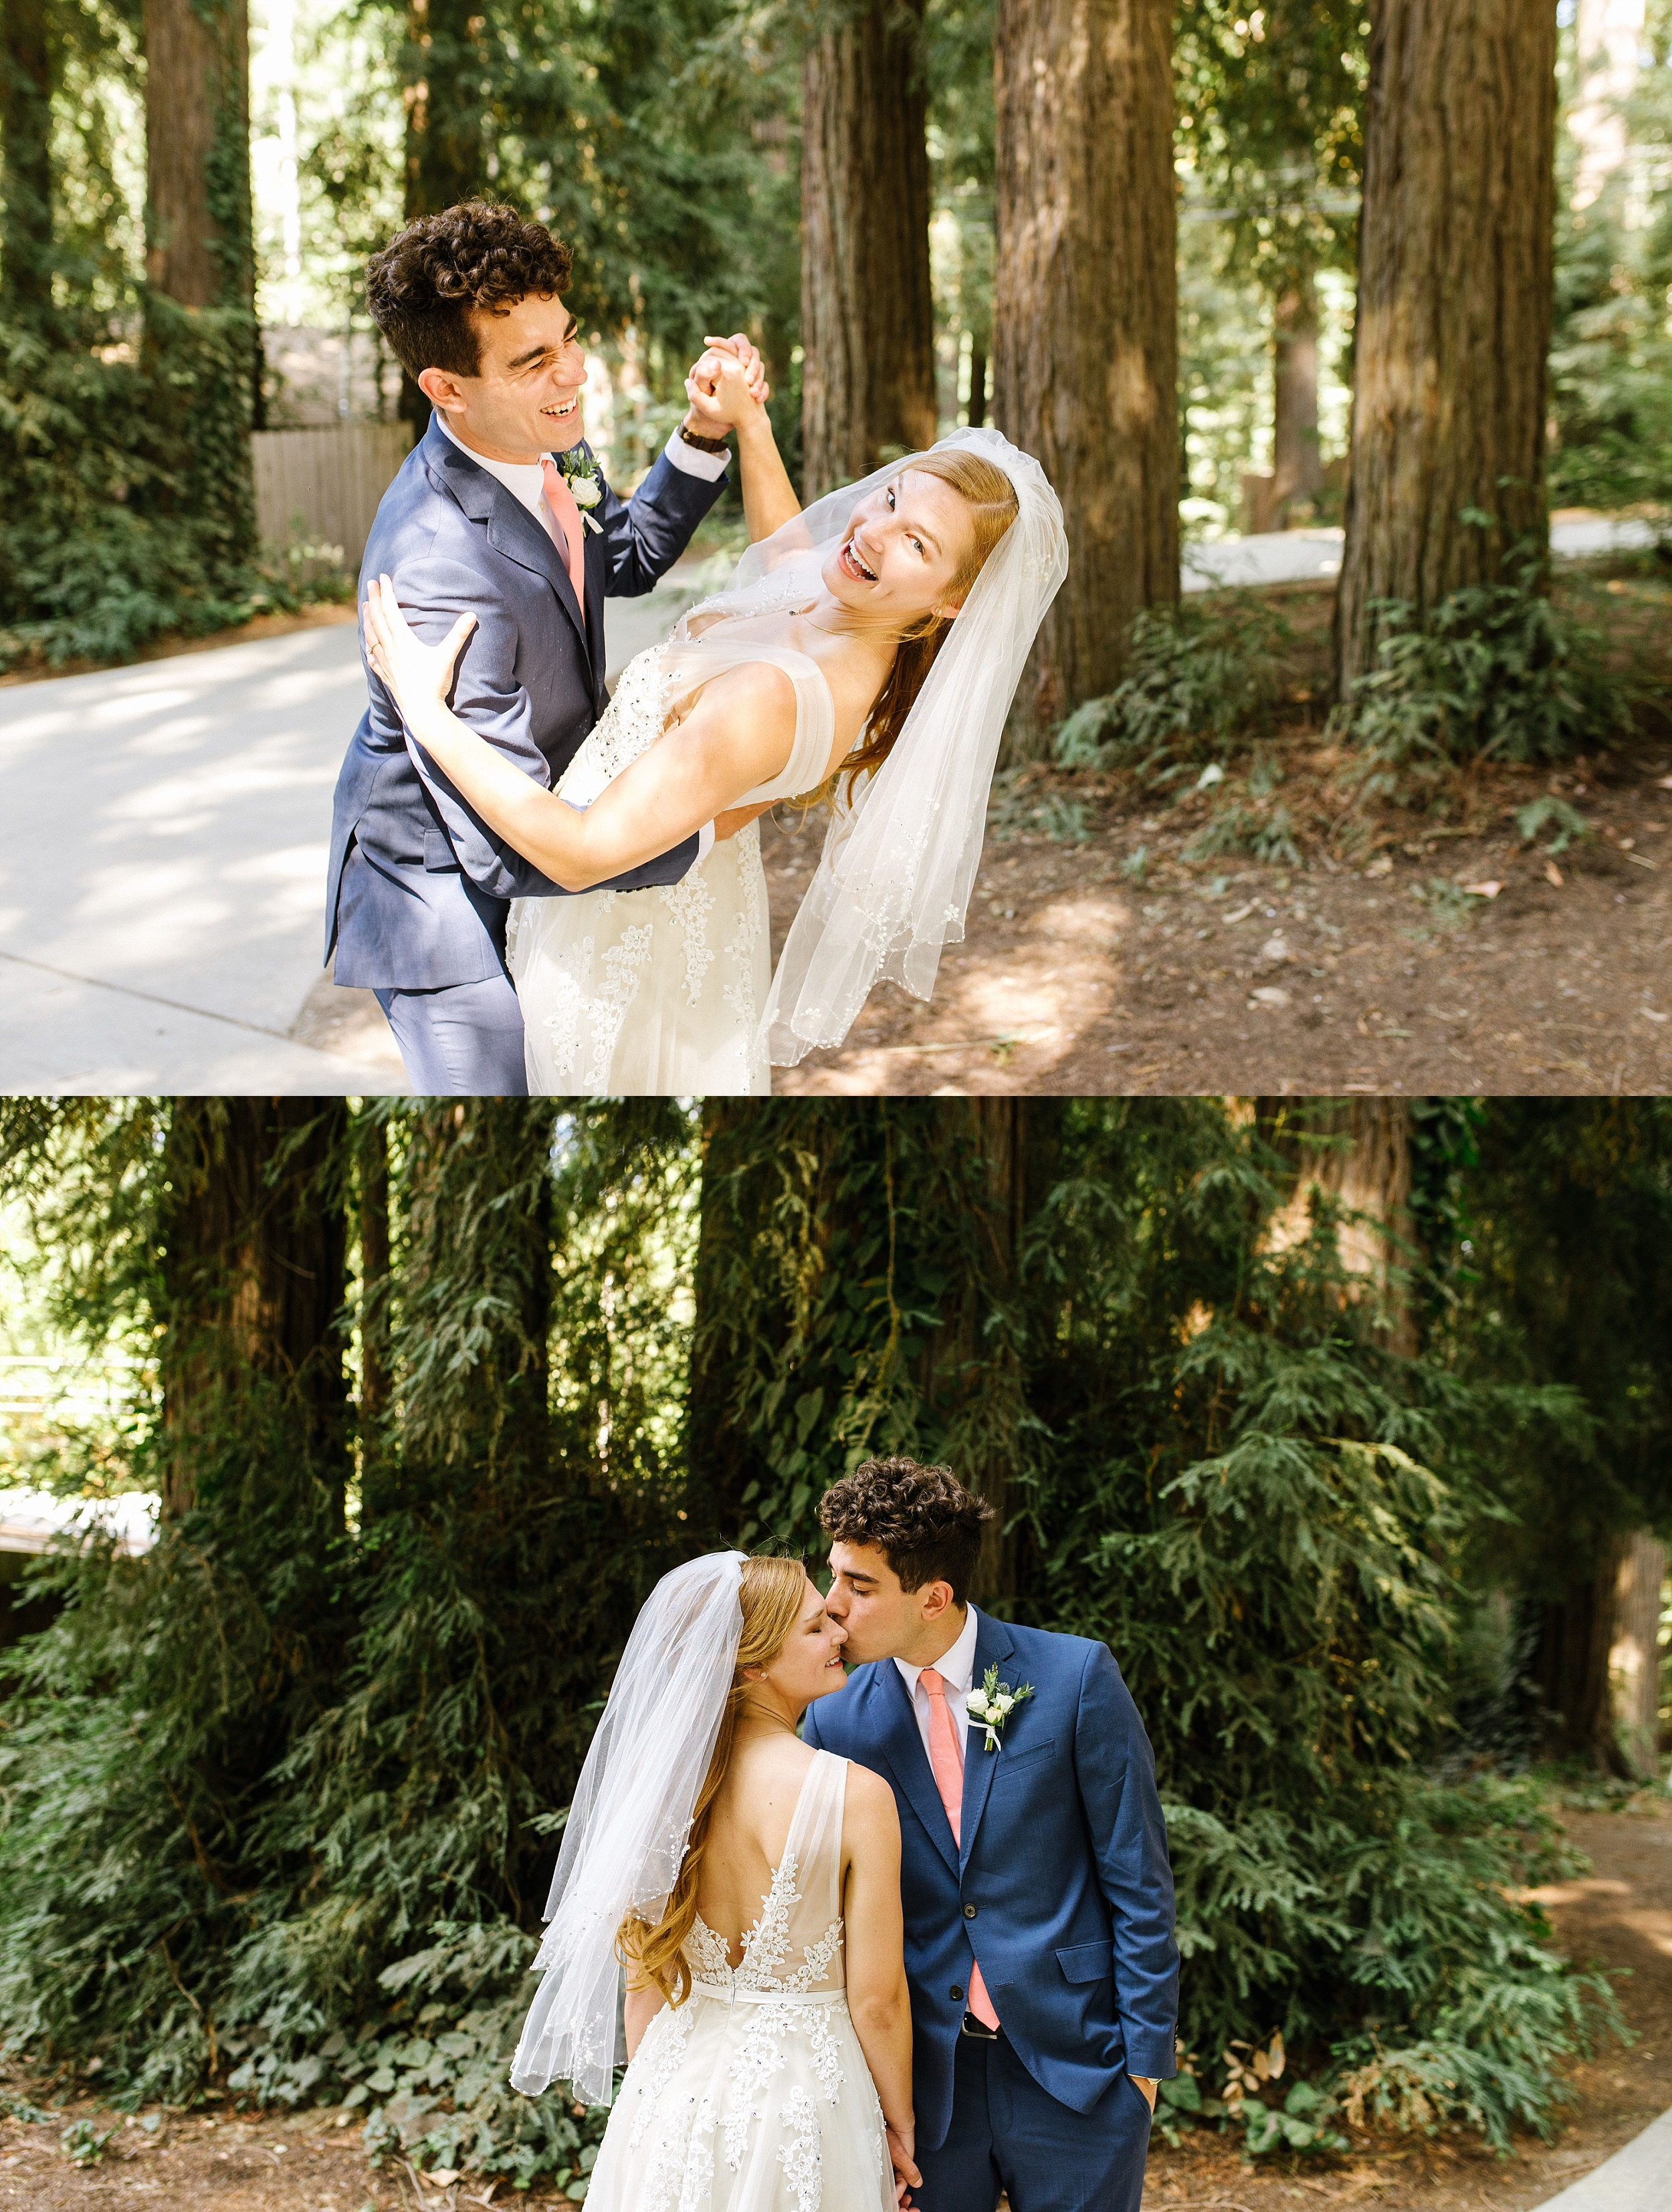 Amphitheatre-of-the-Redwoods-wedding-erikariley_chelsea-dier-photography_0008.jpg